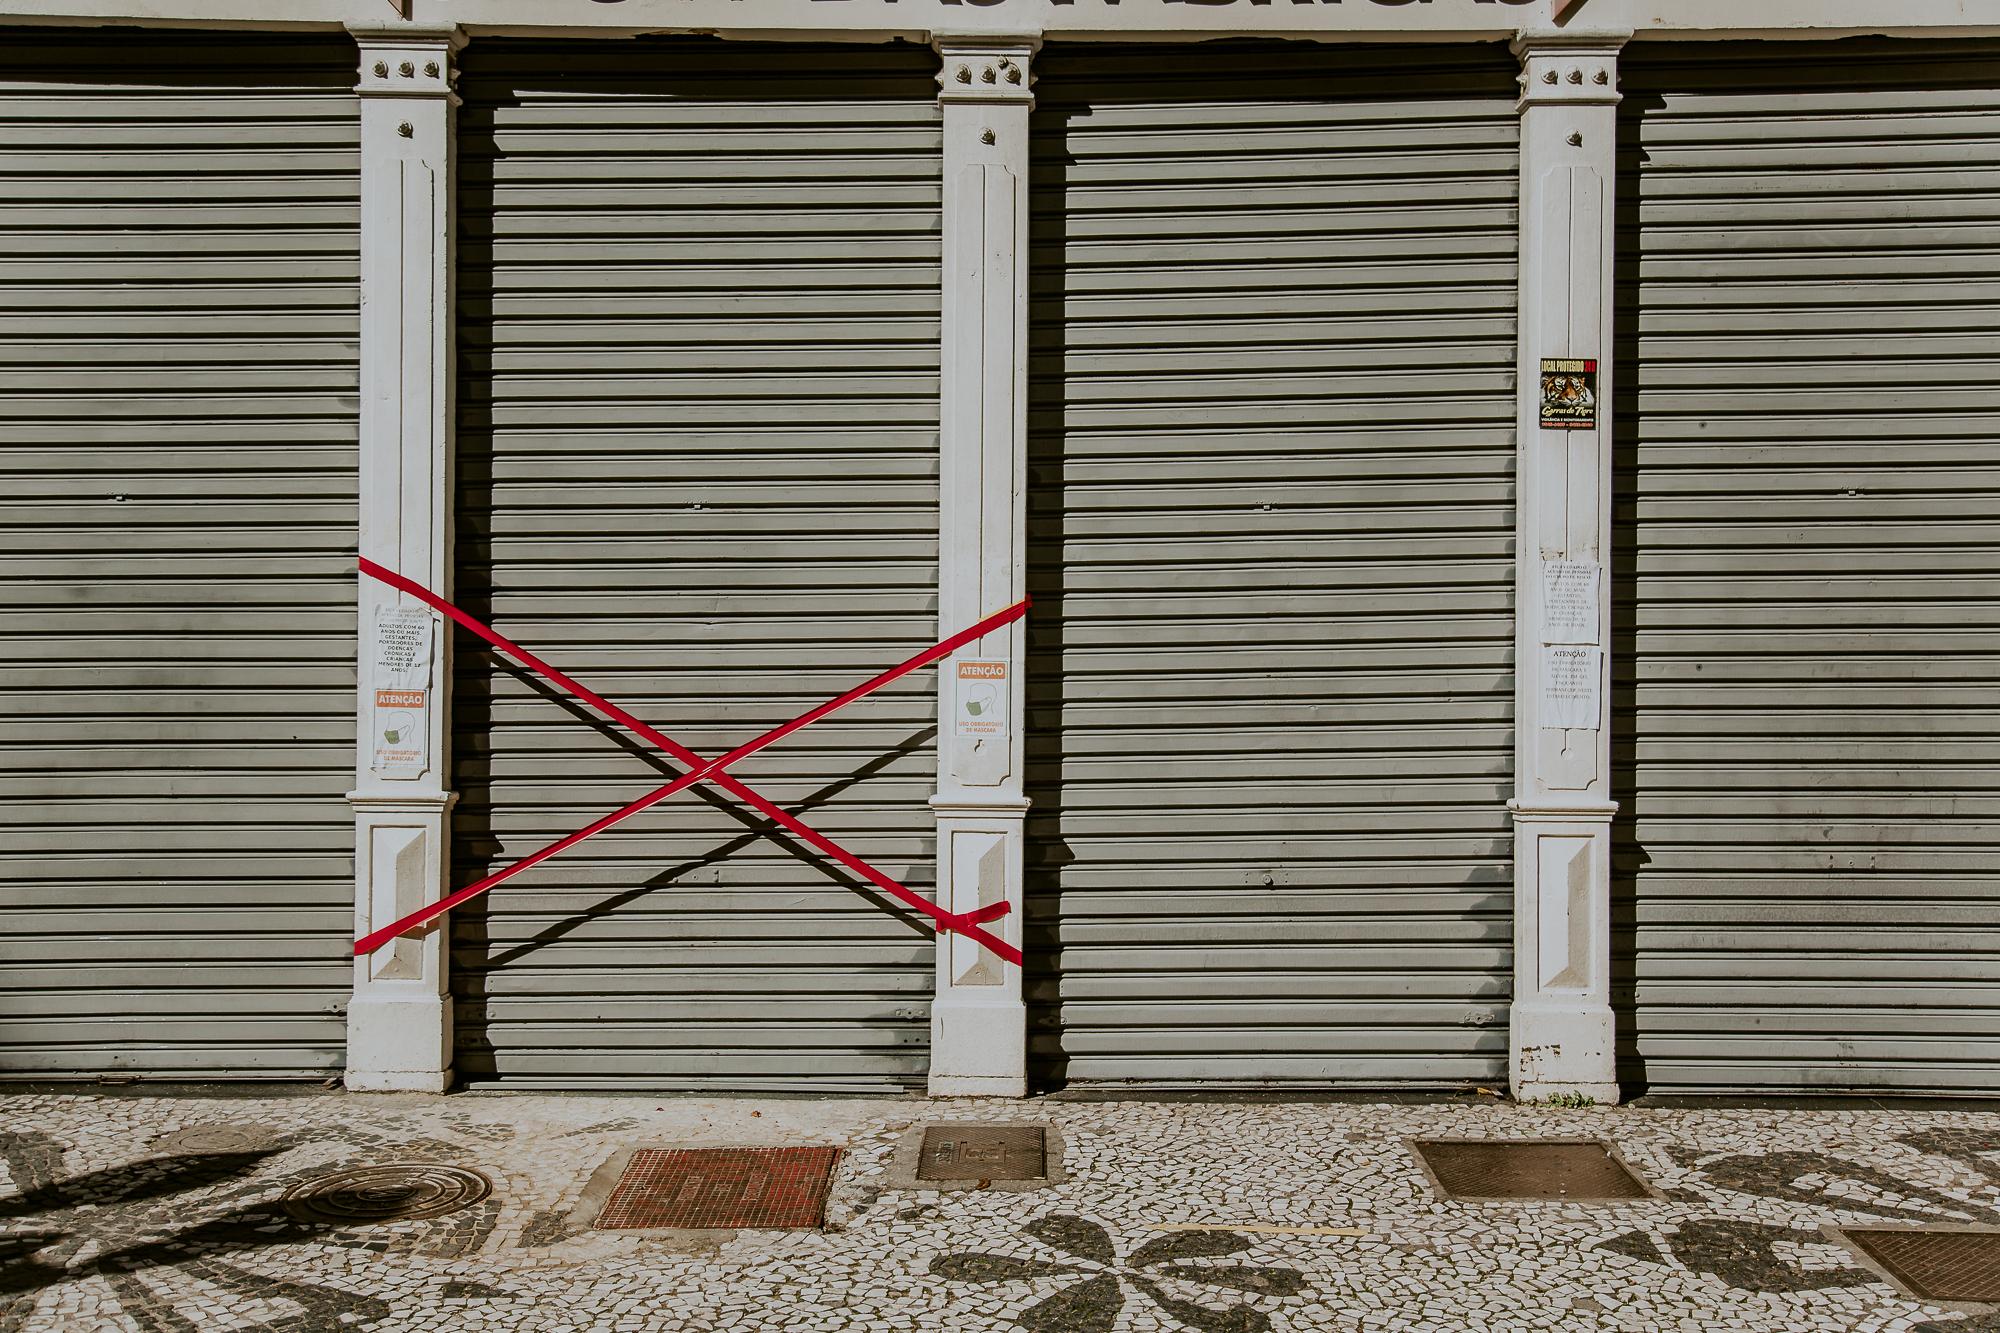 8 pedidos dos vereadores de Curitiba para socorrer os empresários locais